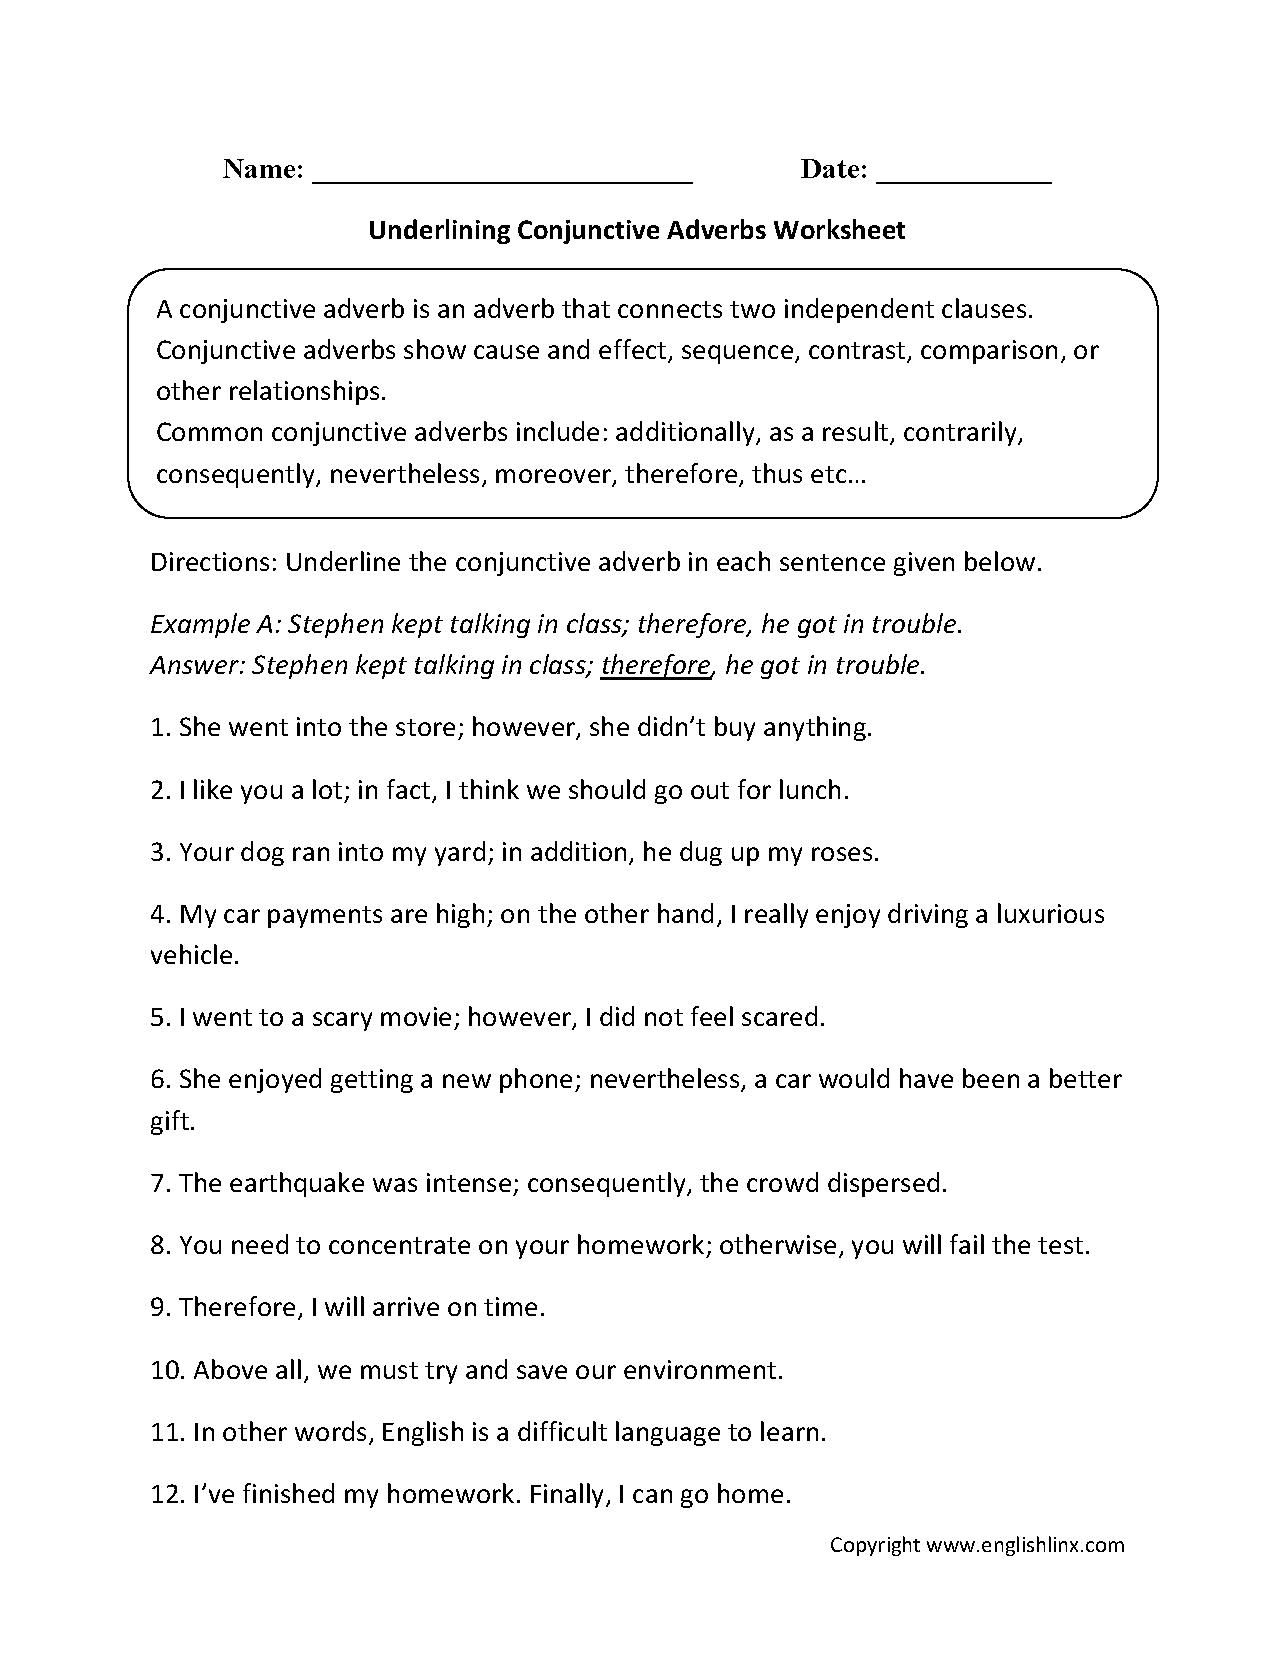 Conjunctions Worksheets   Underlining Conjunctive Adverbs Worksheet    Conjunctive adverb [ 1662 x 1275 Pixel ]